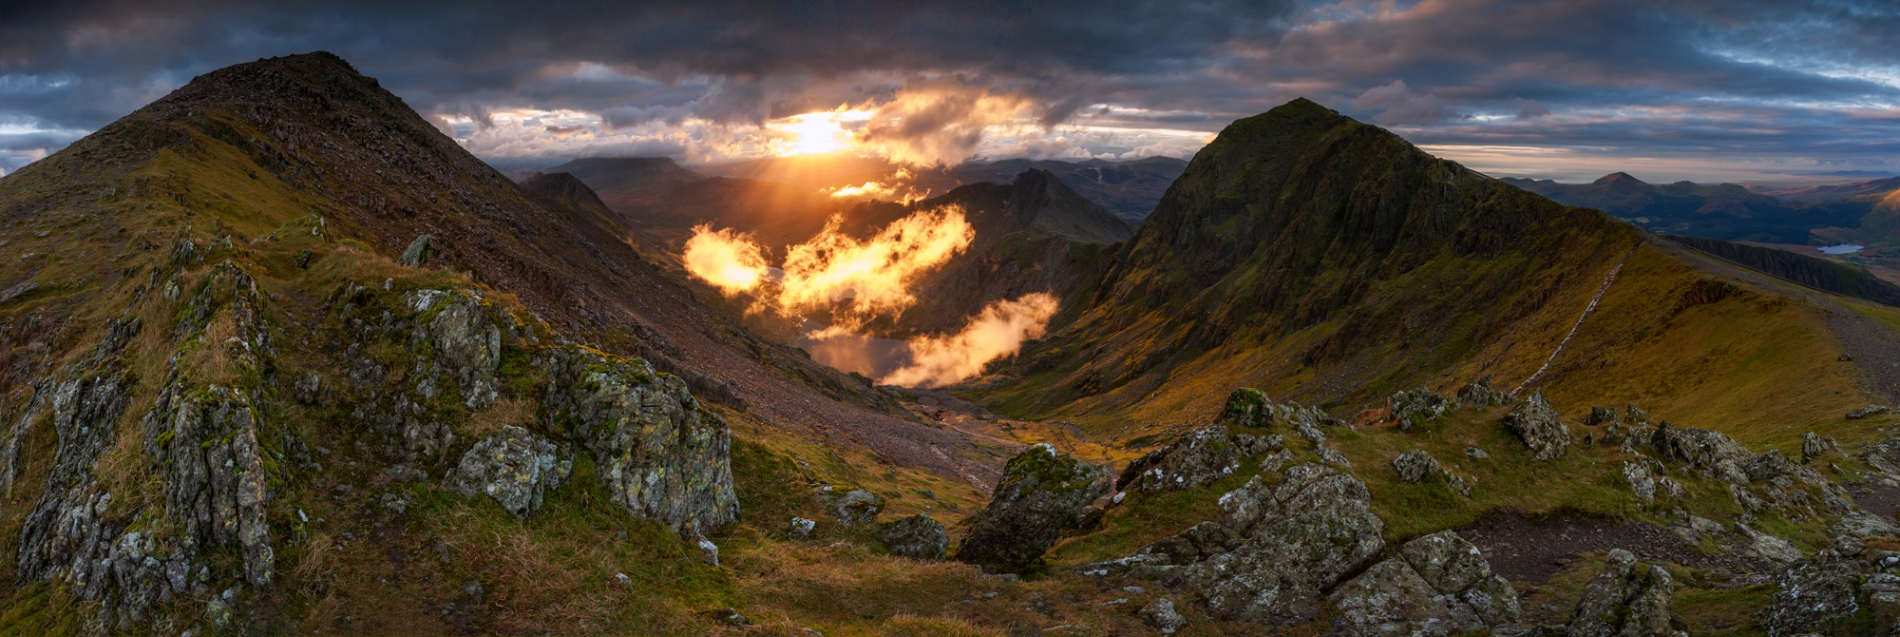 Workshops Snowdonia Wales / Snowdon summit view